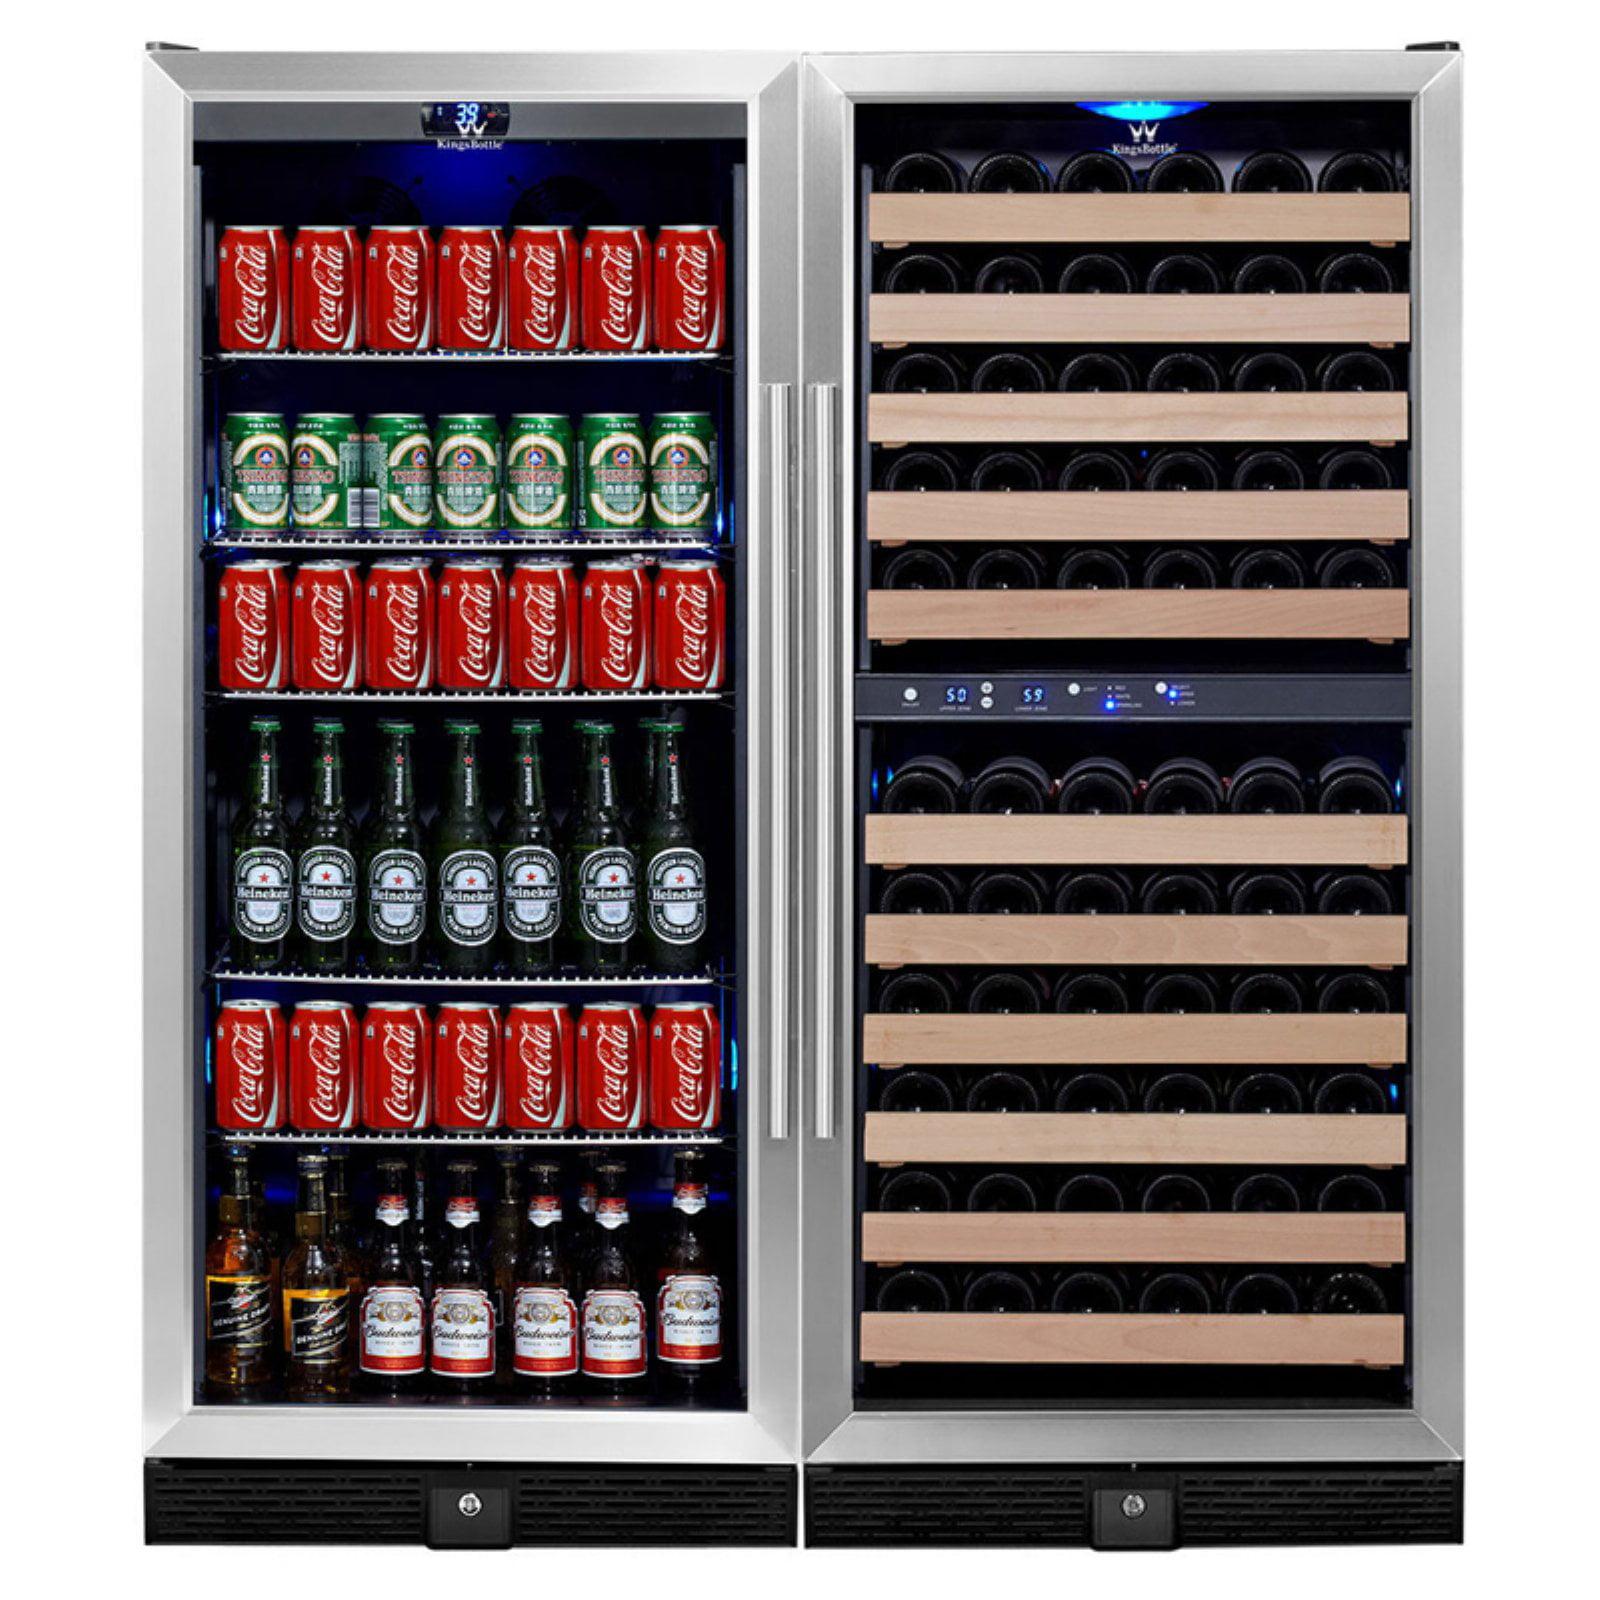 Kingsbottle 106-Wine 300-Beverage 3Temp Fridge